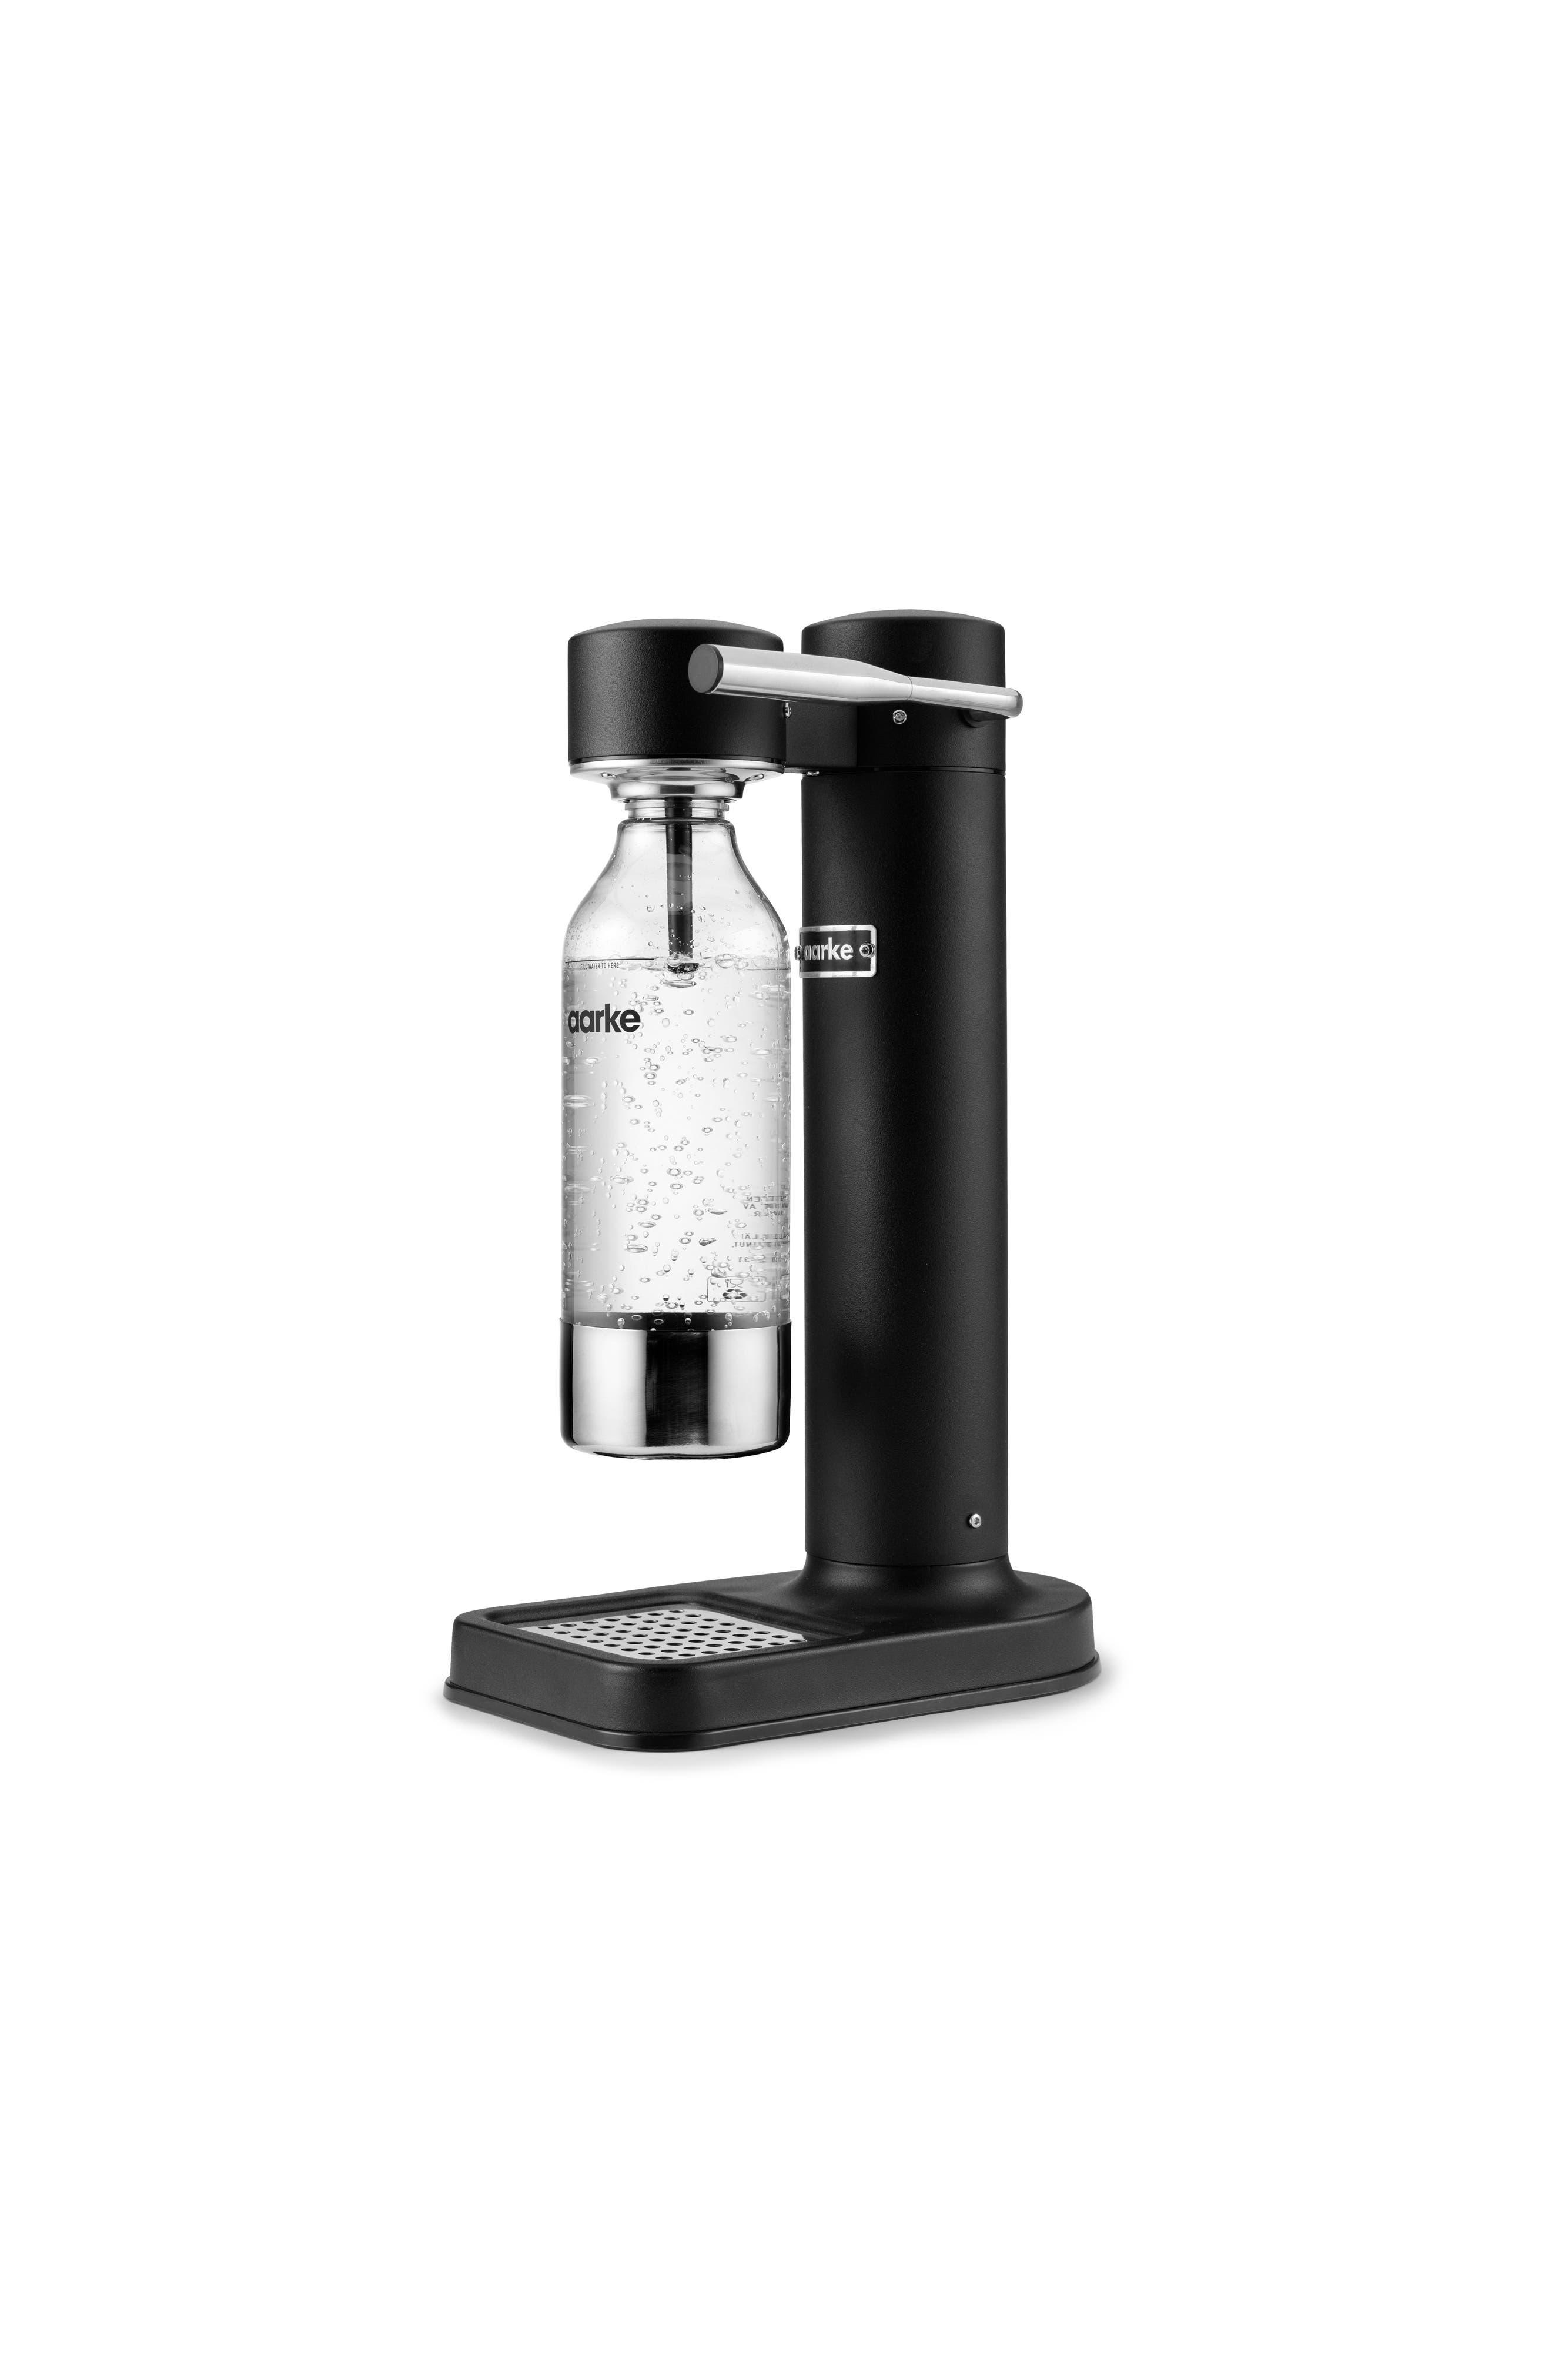 AARKE,                             Stainless Steel Sparkling Water Maker,                             Alternate thumbnail 2, color,                             001